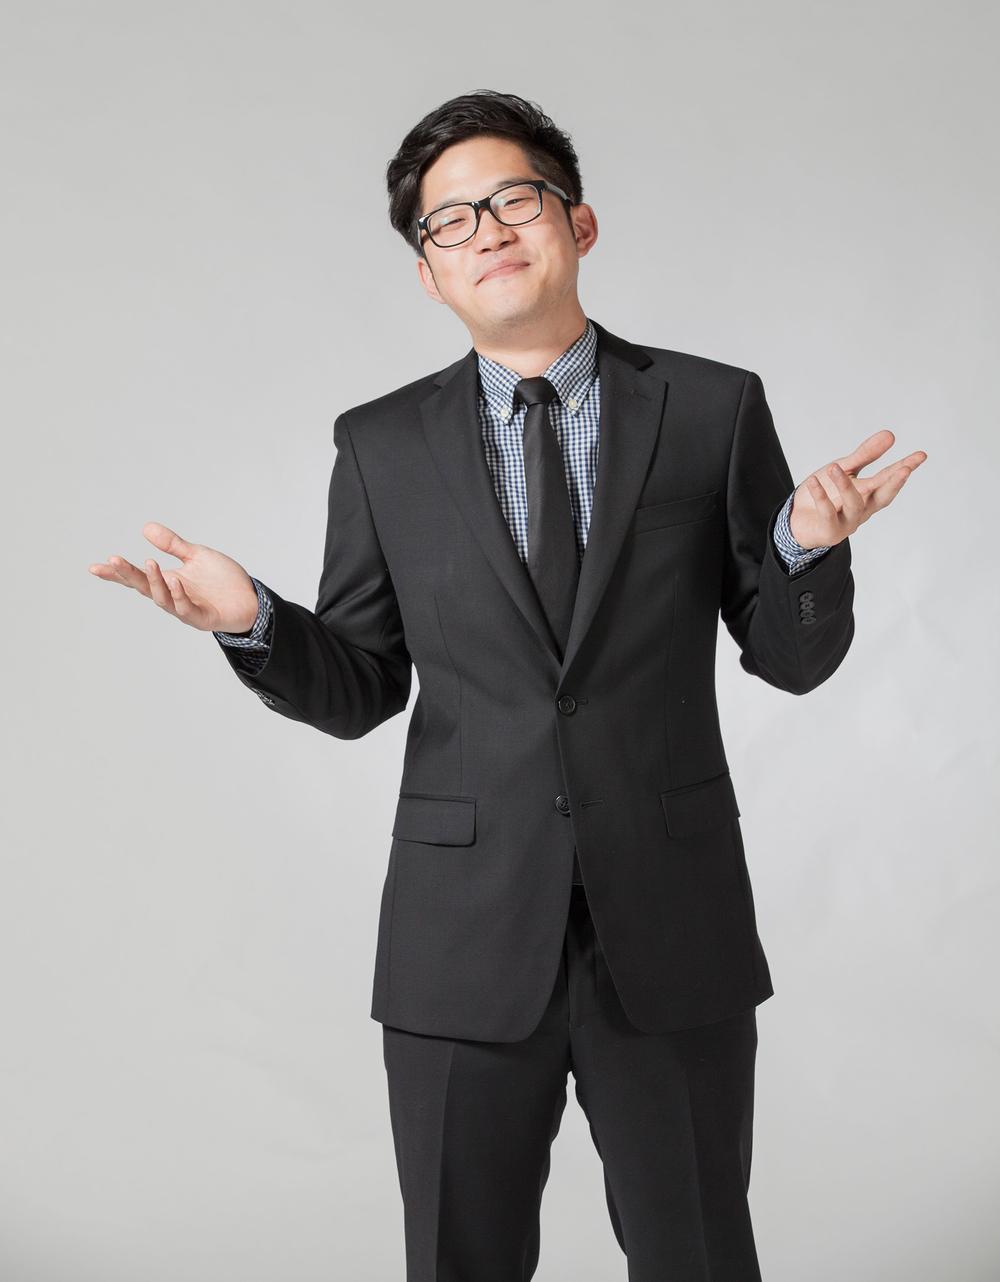 JASON KIM, DJ